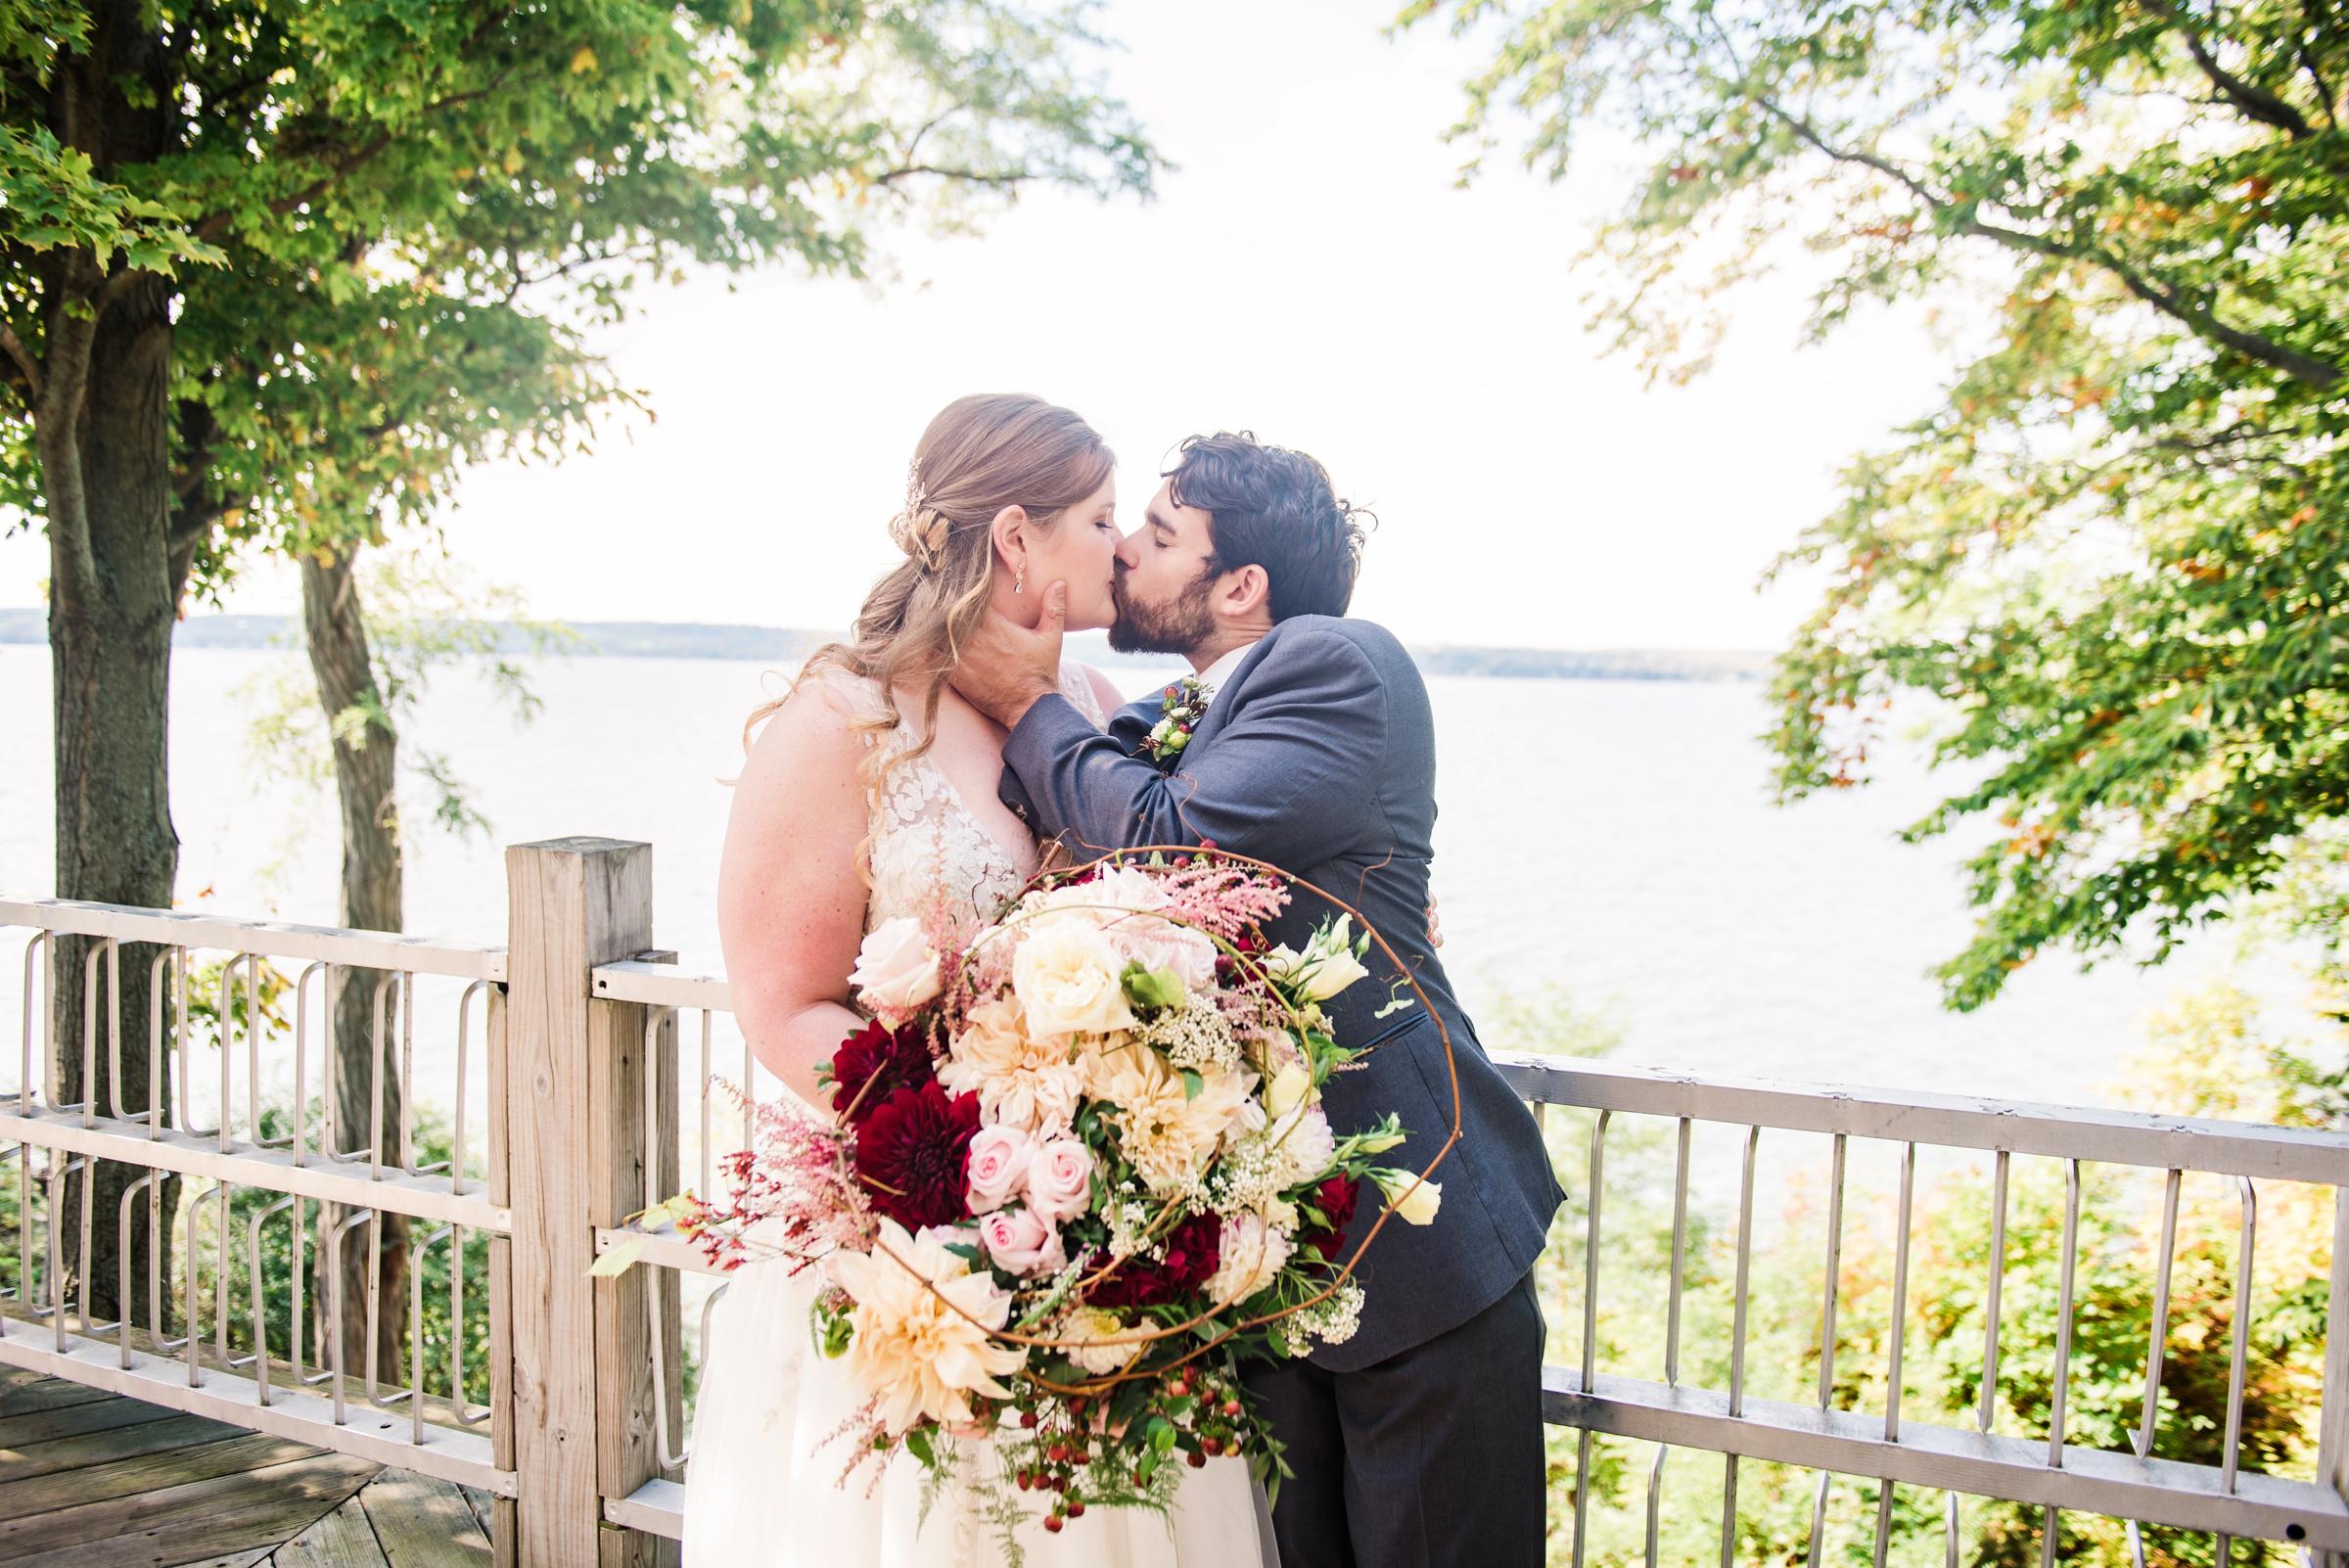 Zugibe_Vineyards_Finger_Lakes_Wedding_JILL_STUDIO_Rochester_NY_Photographer_DSC_3484.jpg